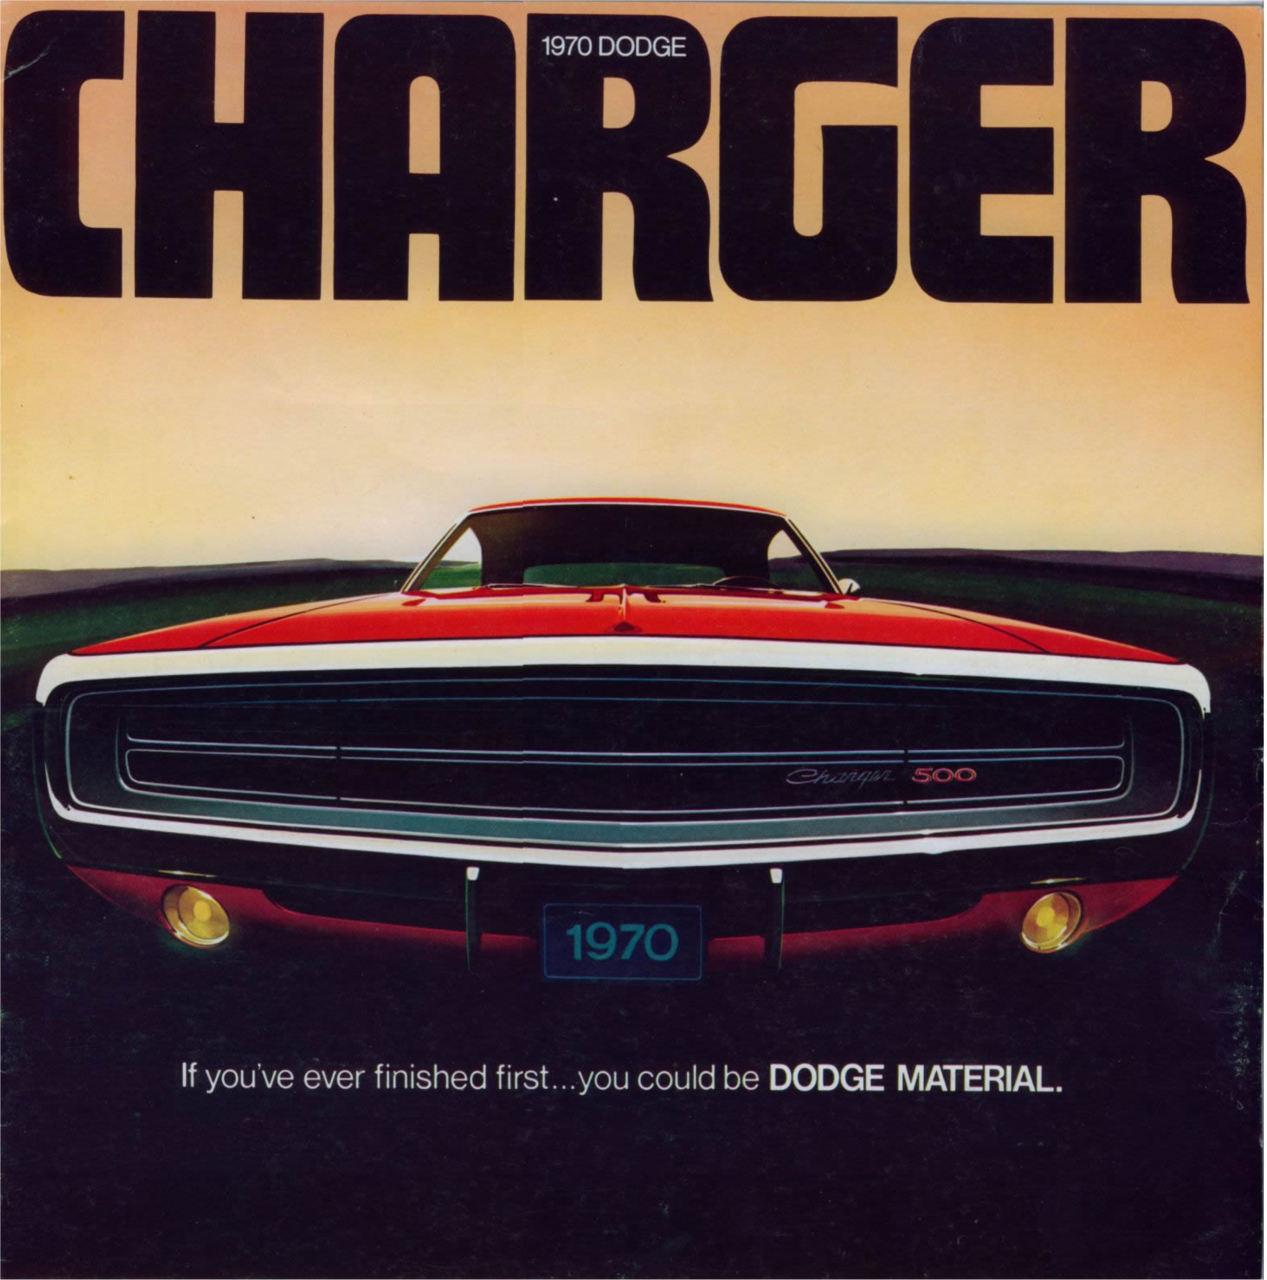 Classic Car Ad Friday - Classic car ads